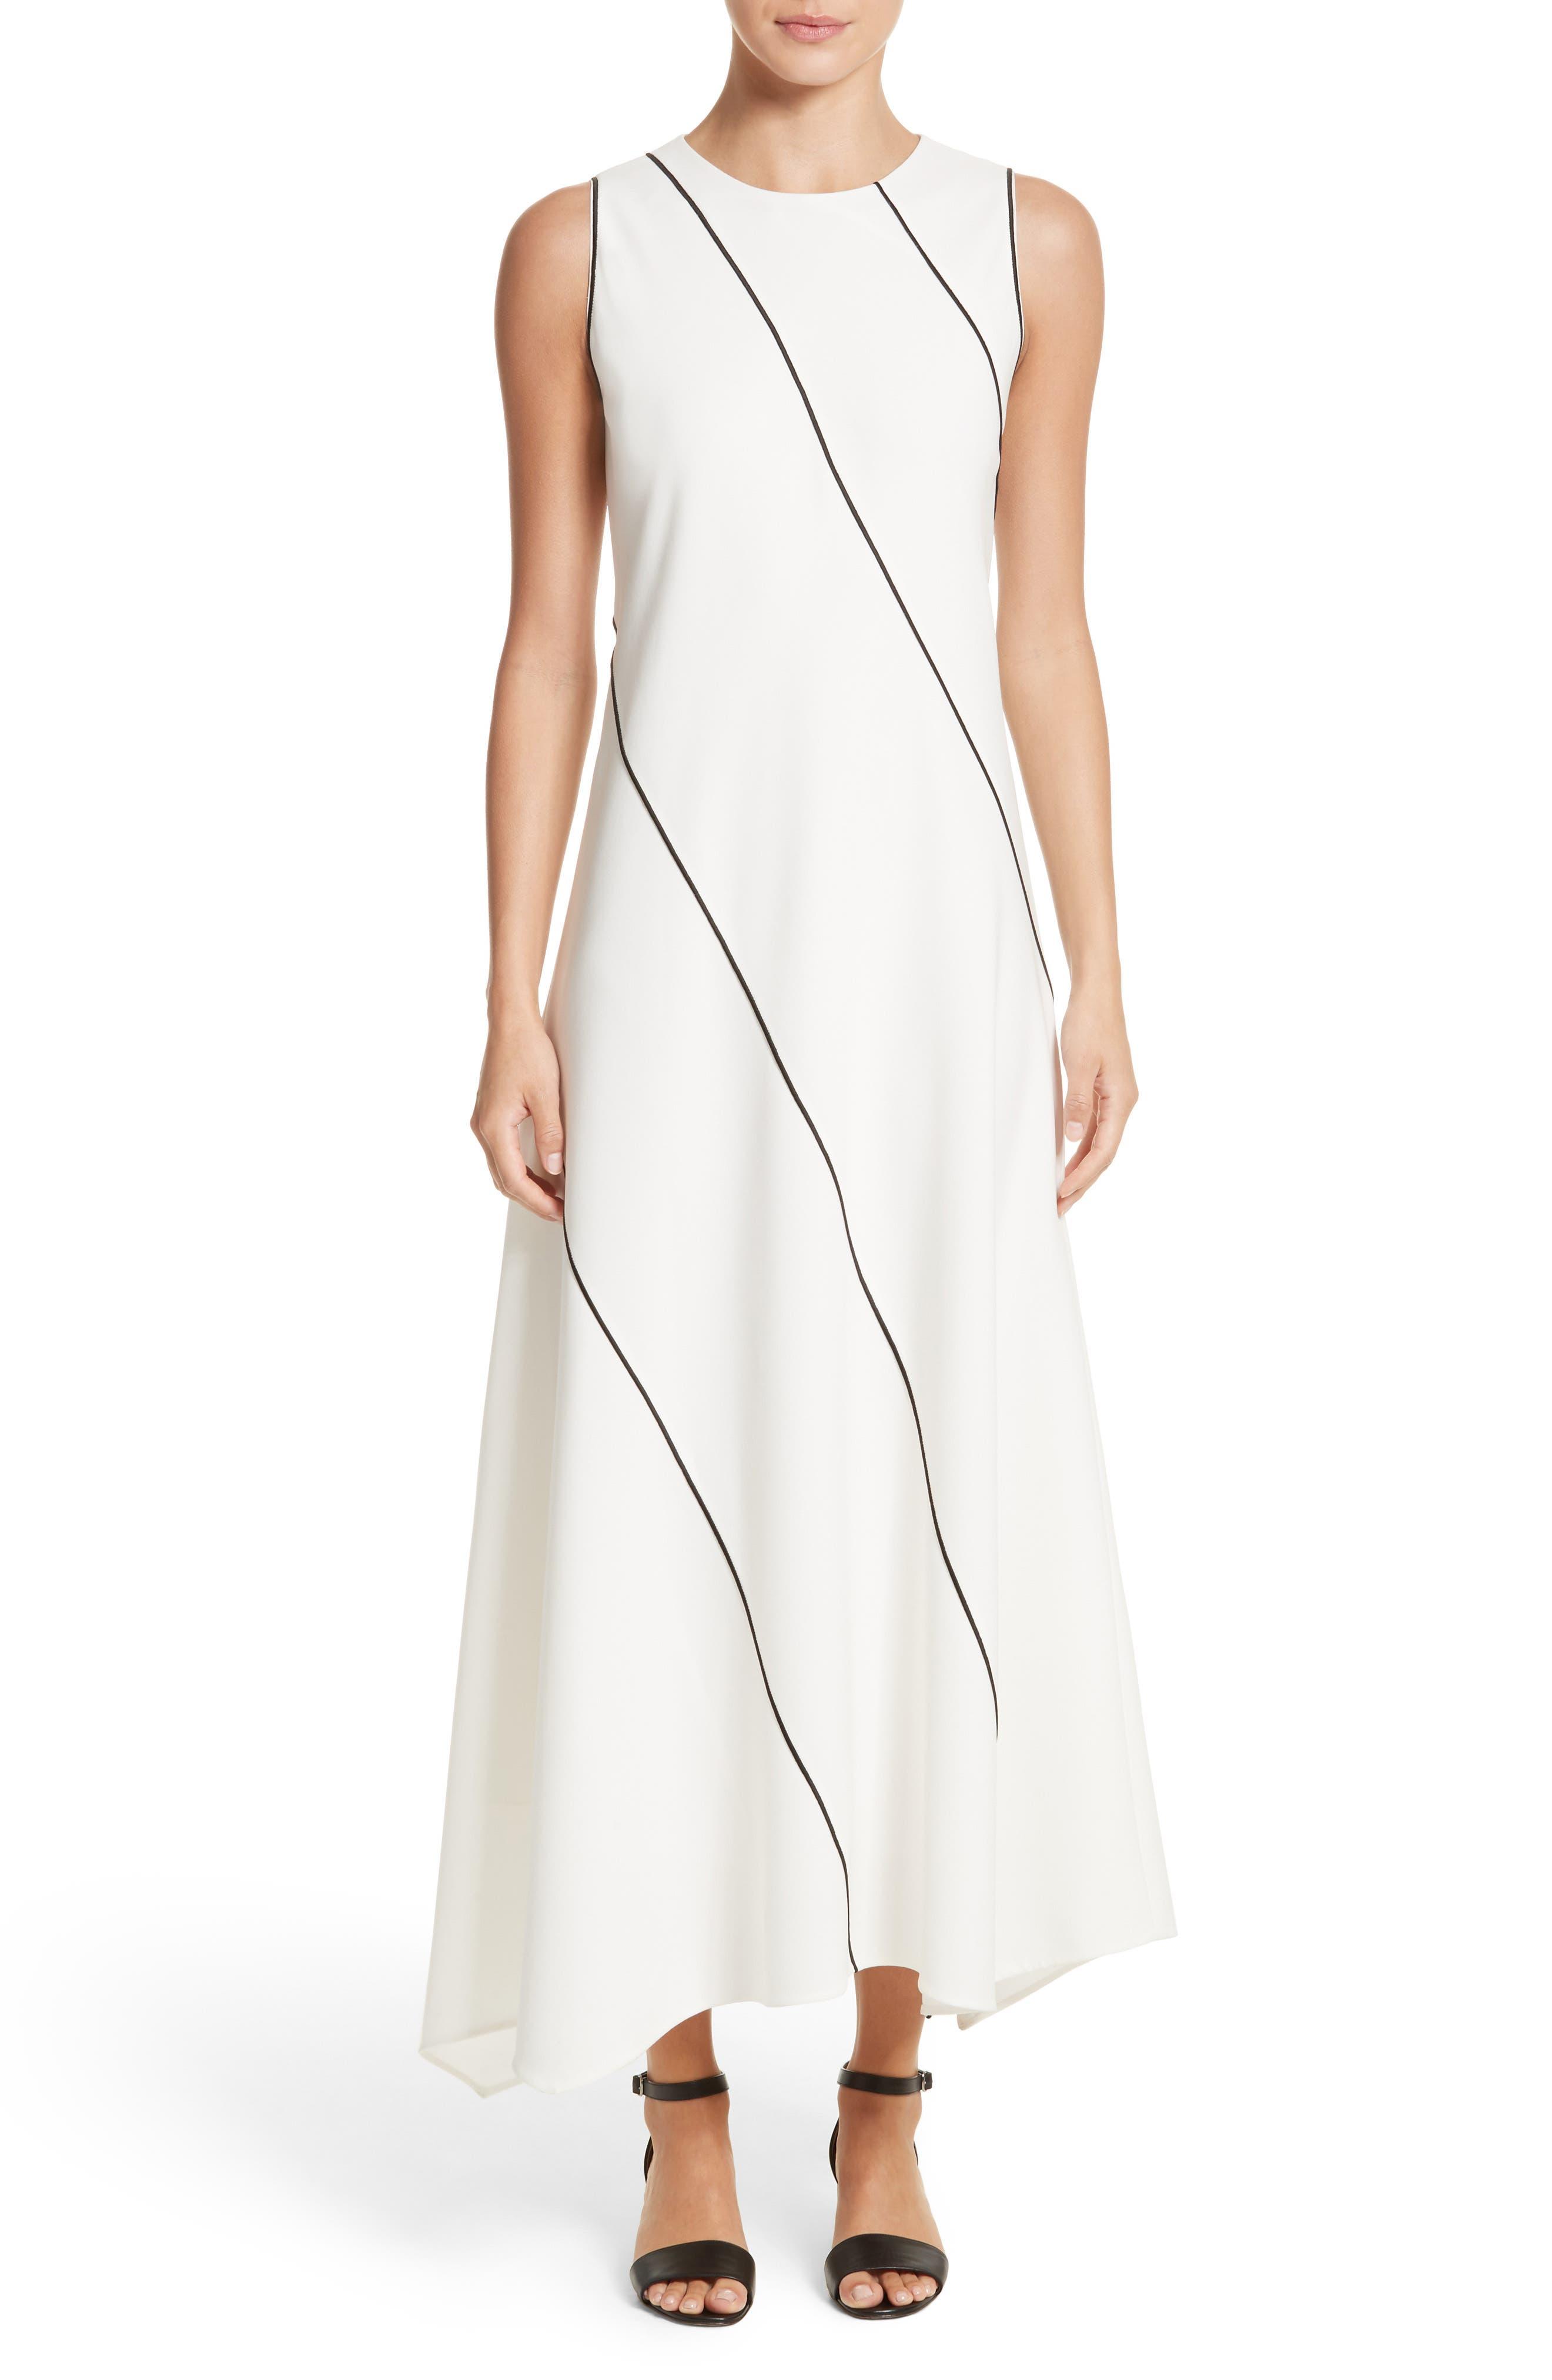 Alternate Image 1 Selected - Lafayette 148 New York Madelia Crepe Midi Dress